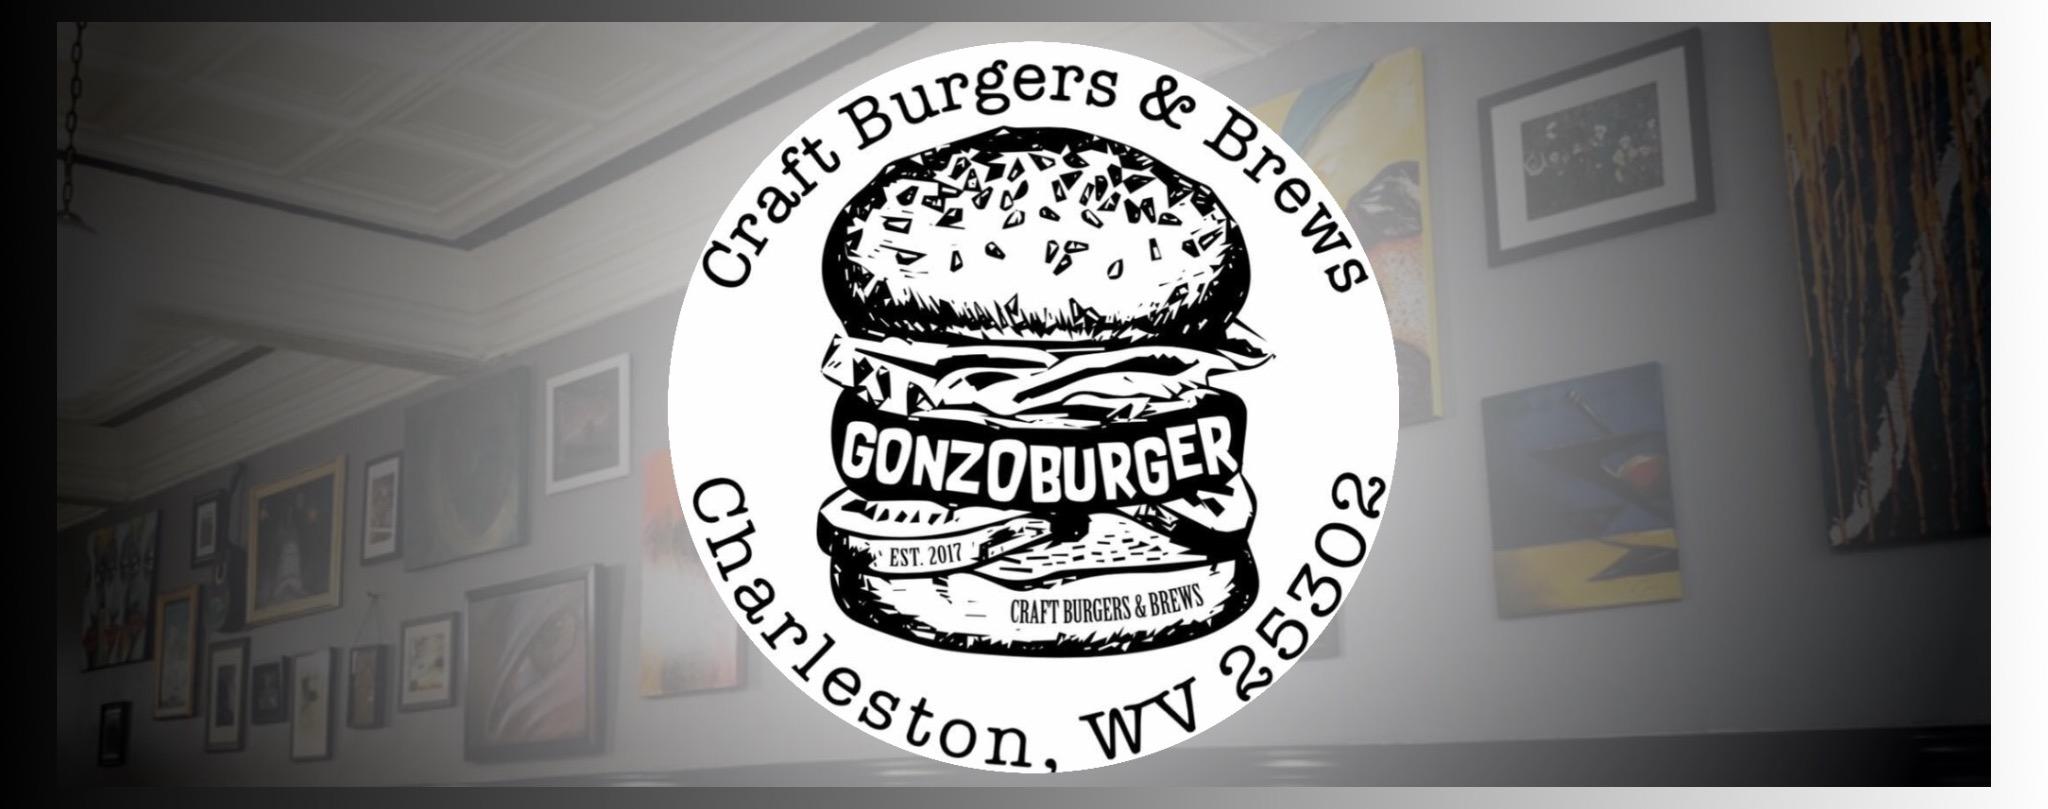 gonzoburger-thumbnail.JPG